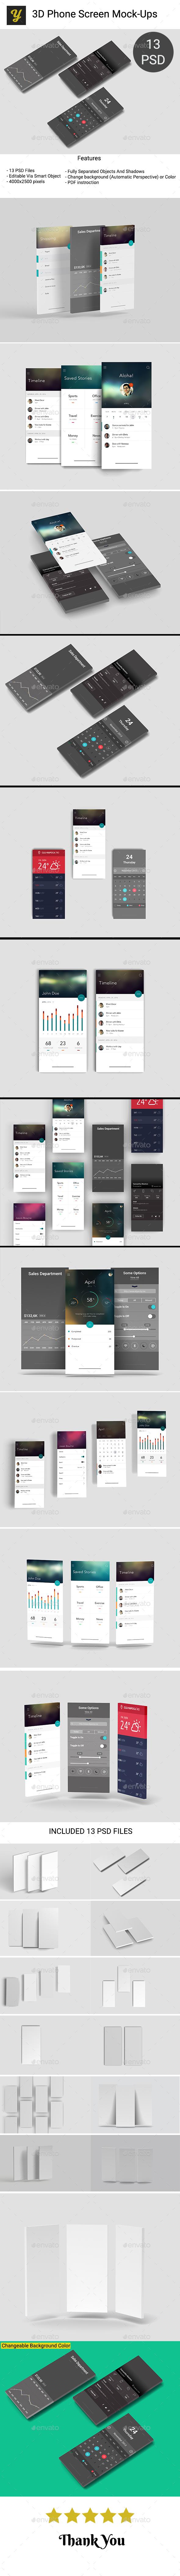 3D Phone Screen Mock-Up - Mobile Displays